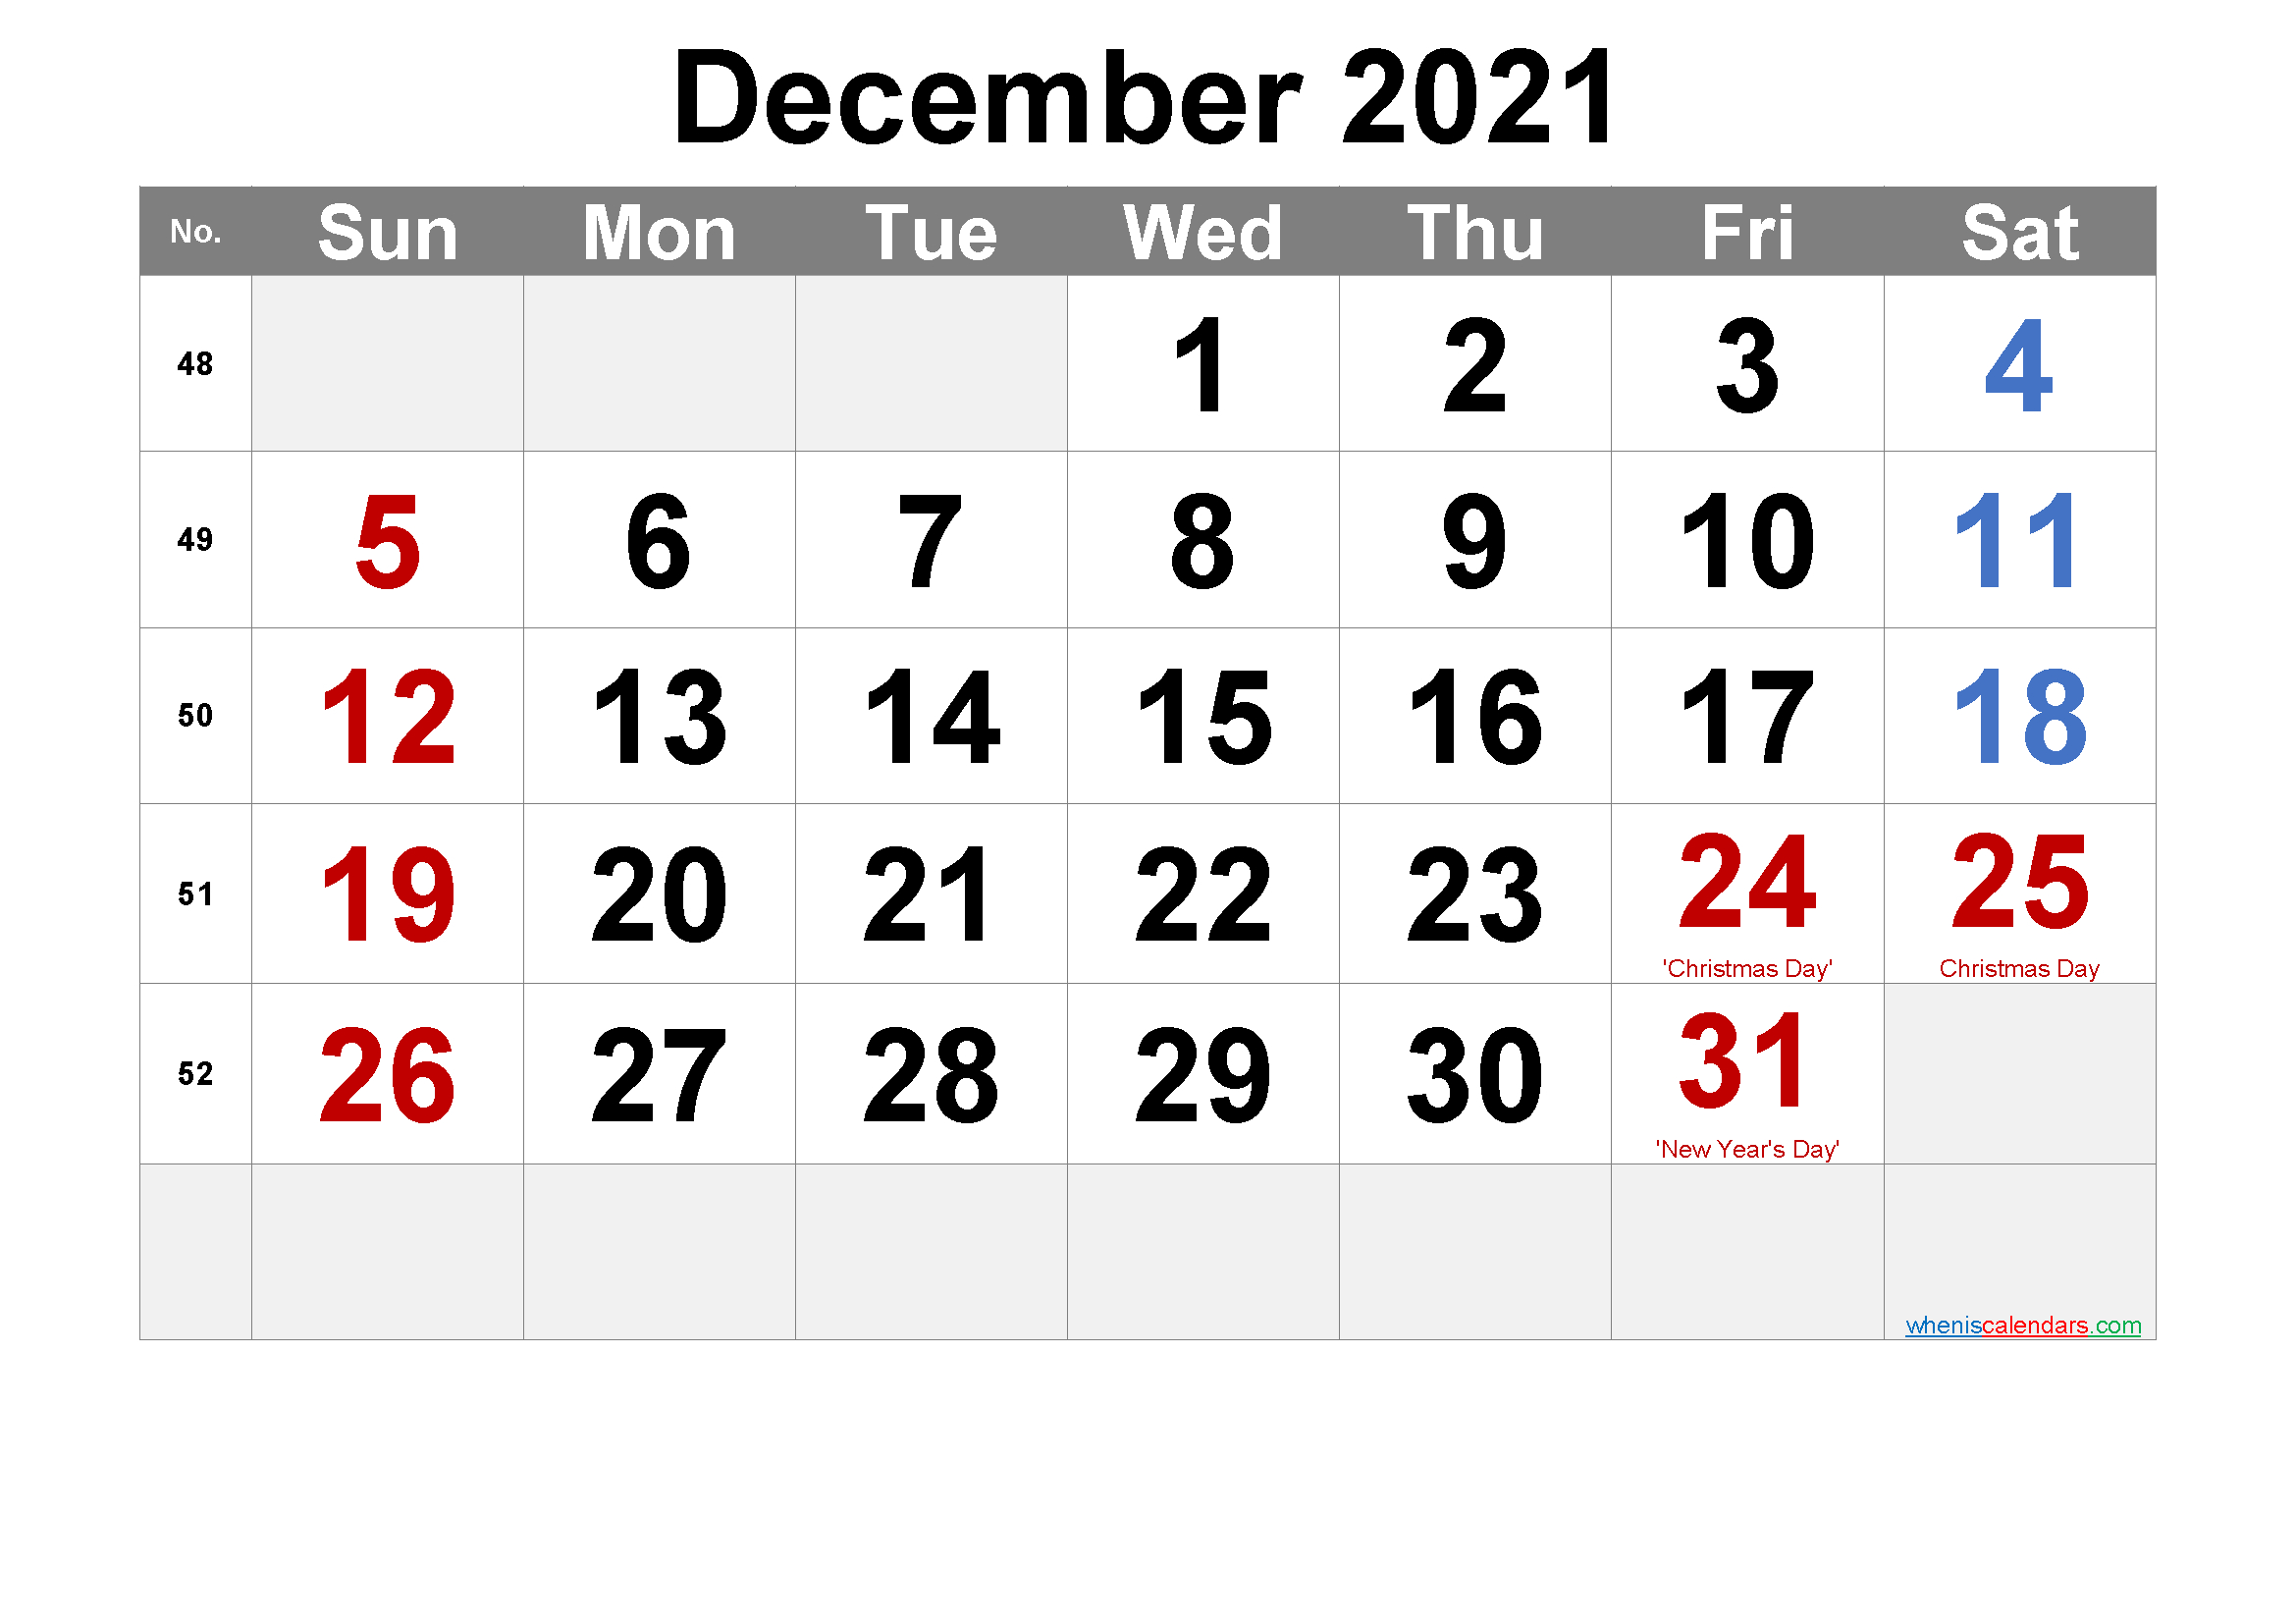 December 2021 Printable Calendar With Holidays - 6 Templates December 2021 Calendar Printable Free